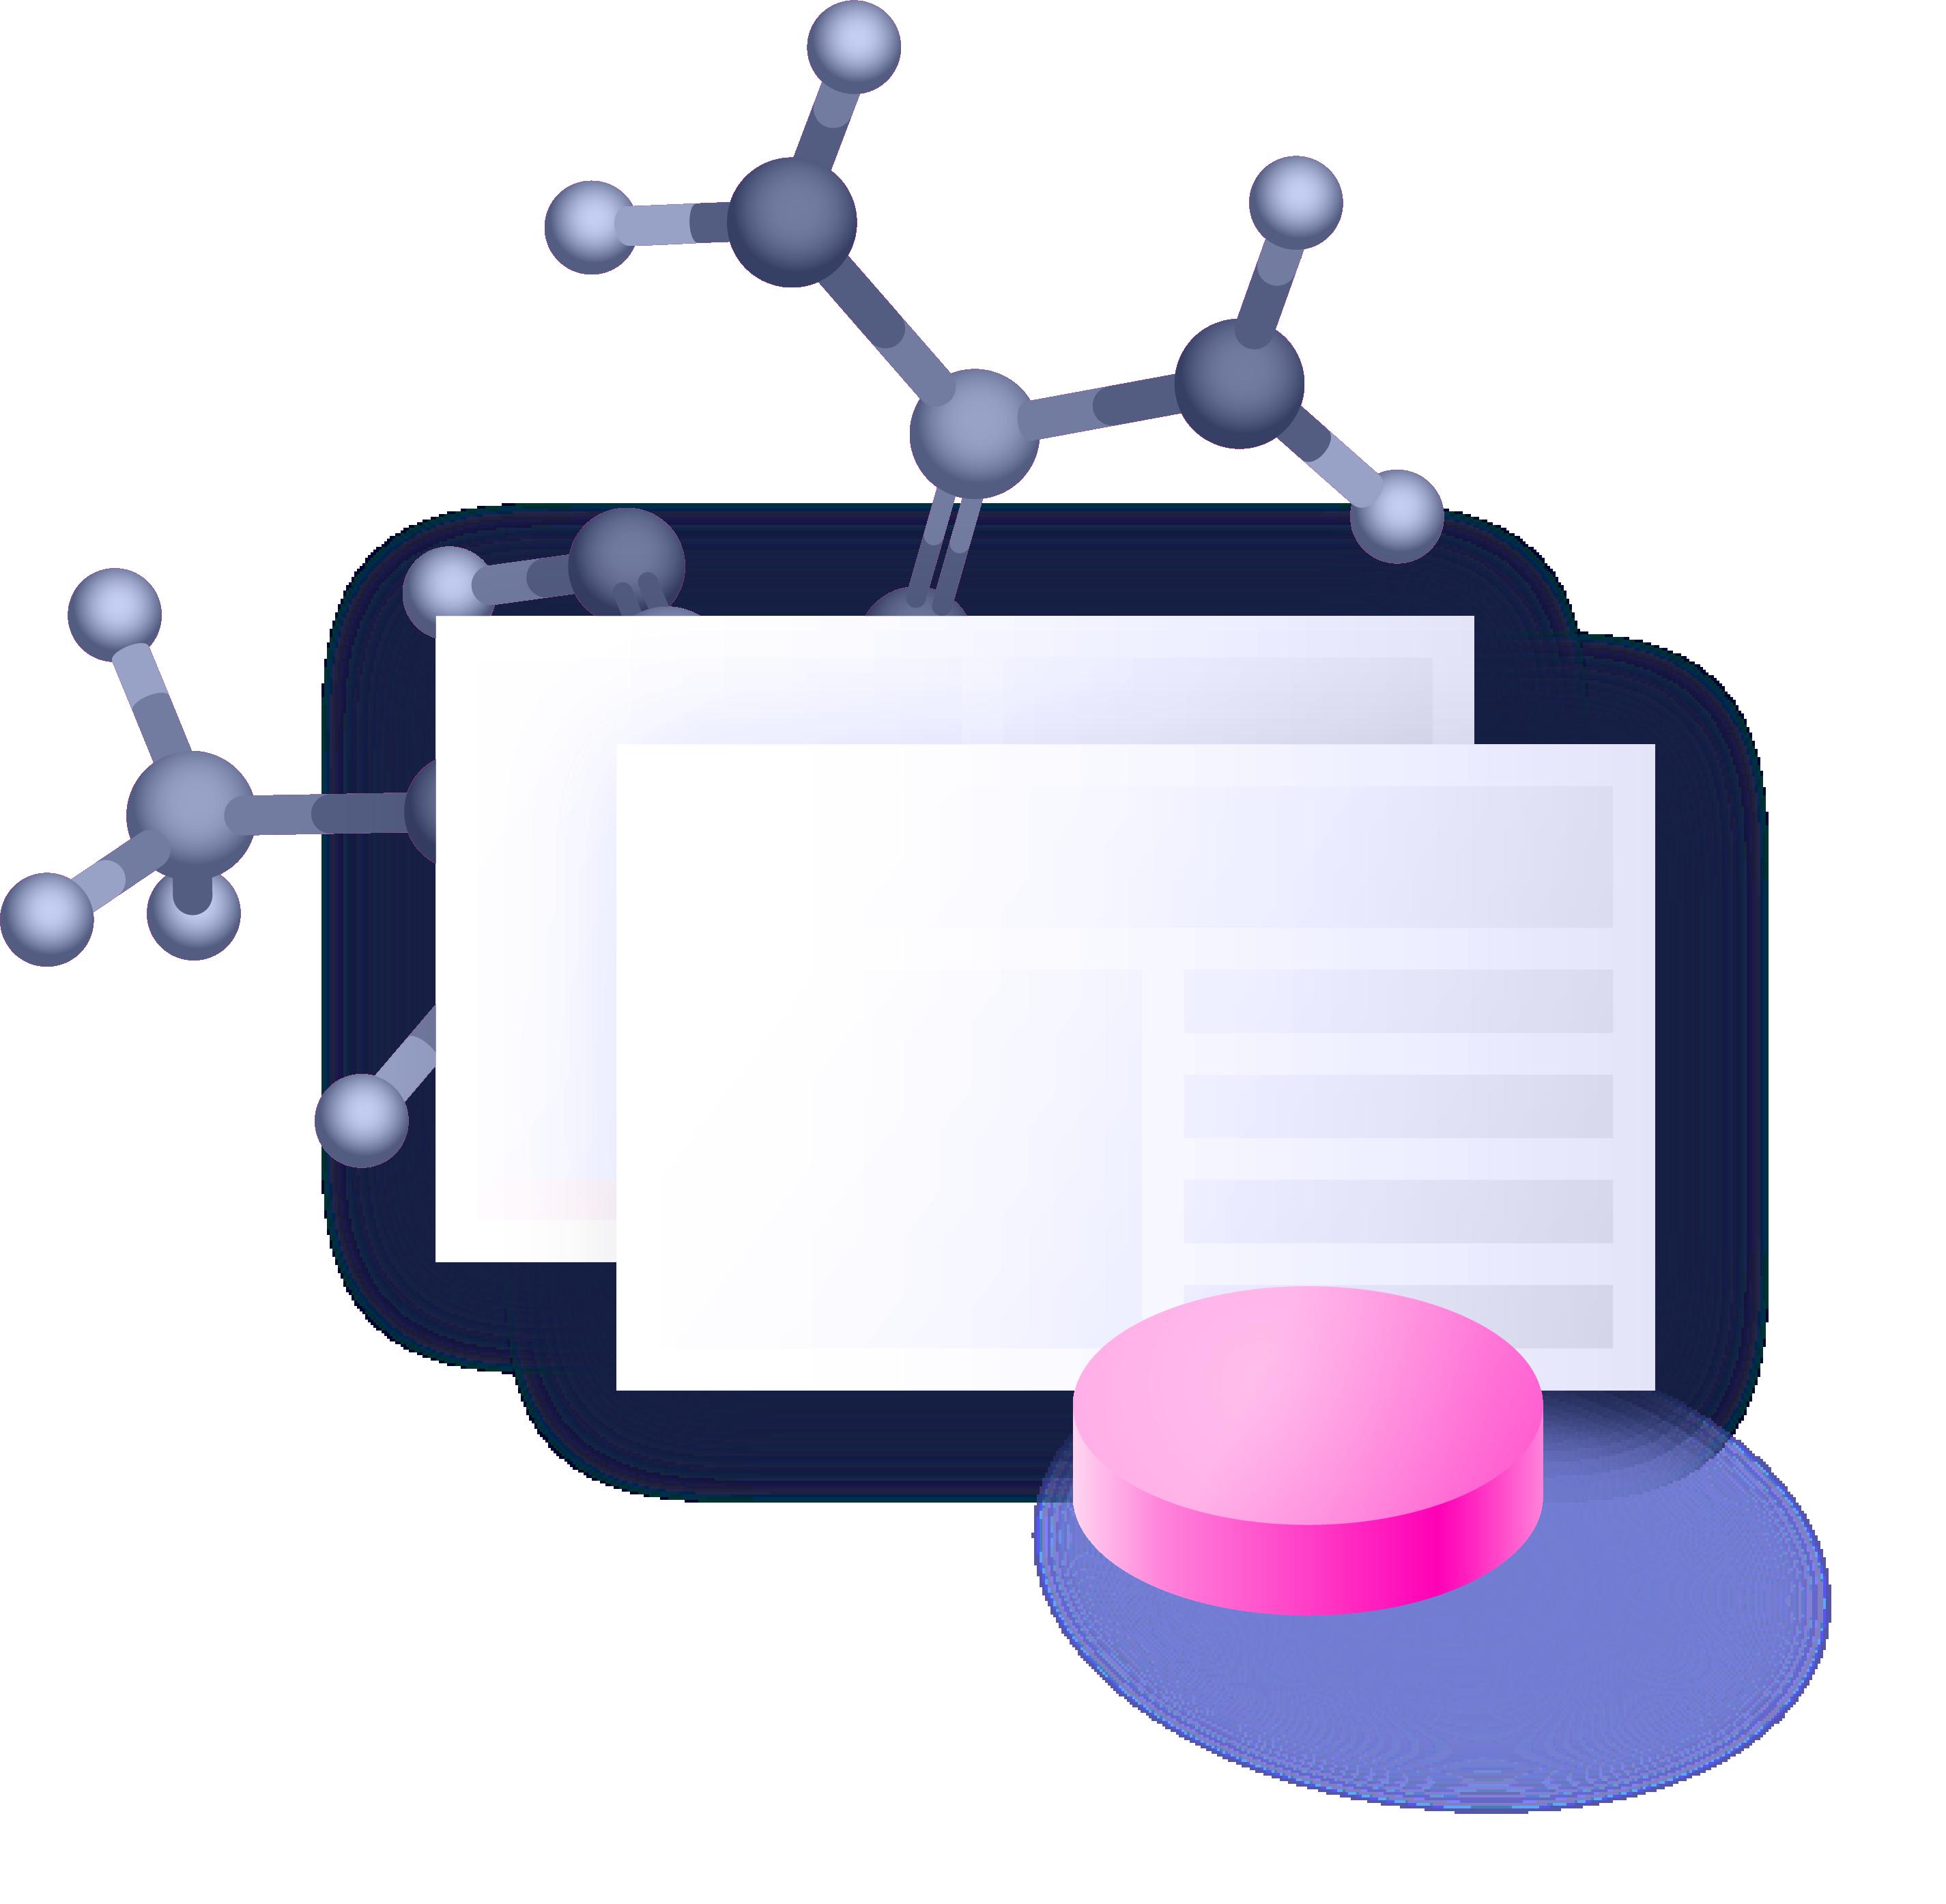 Molecule & Data